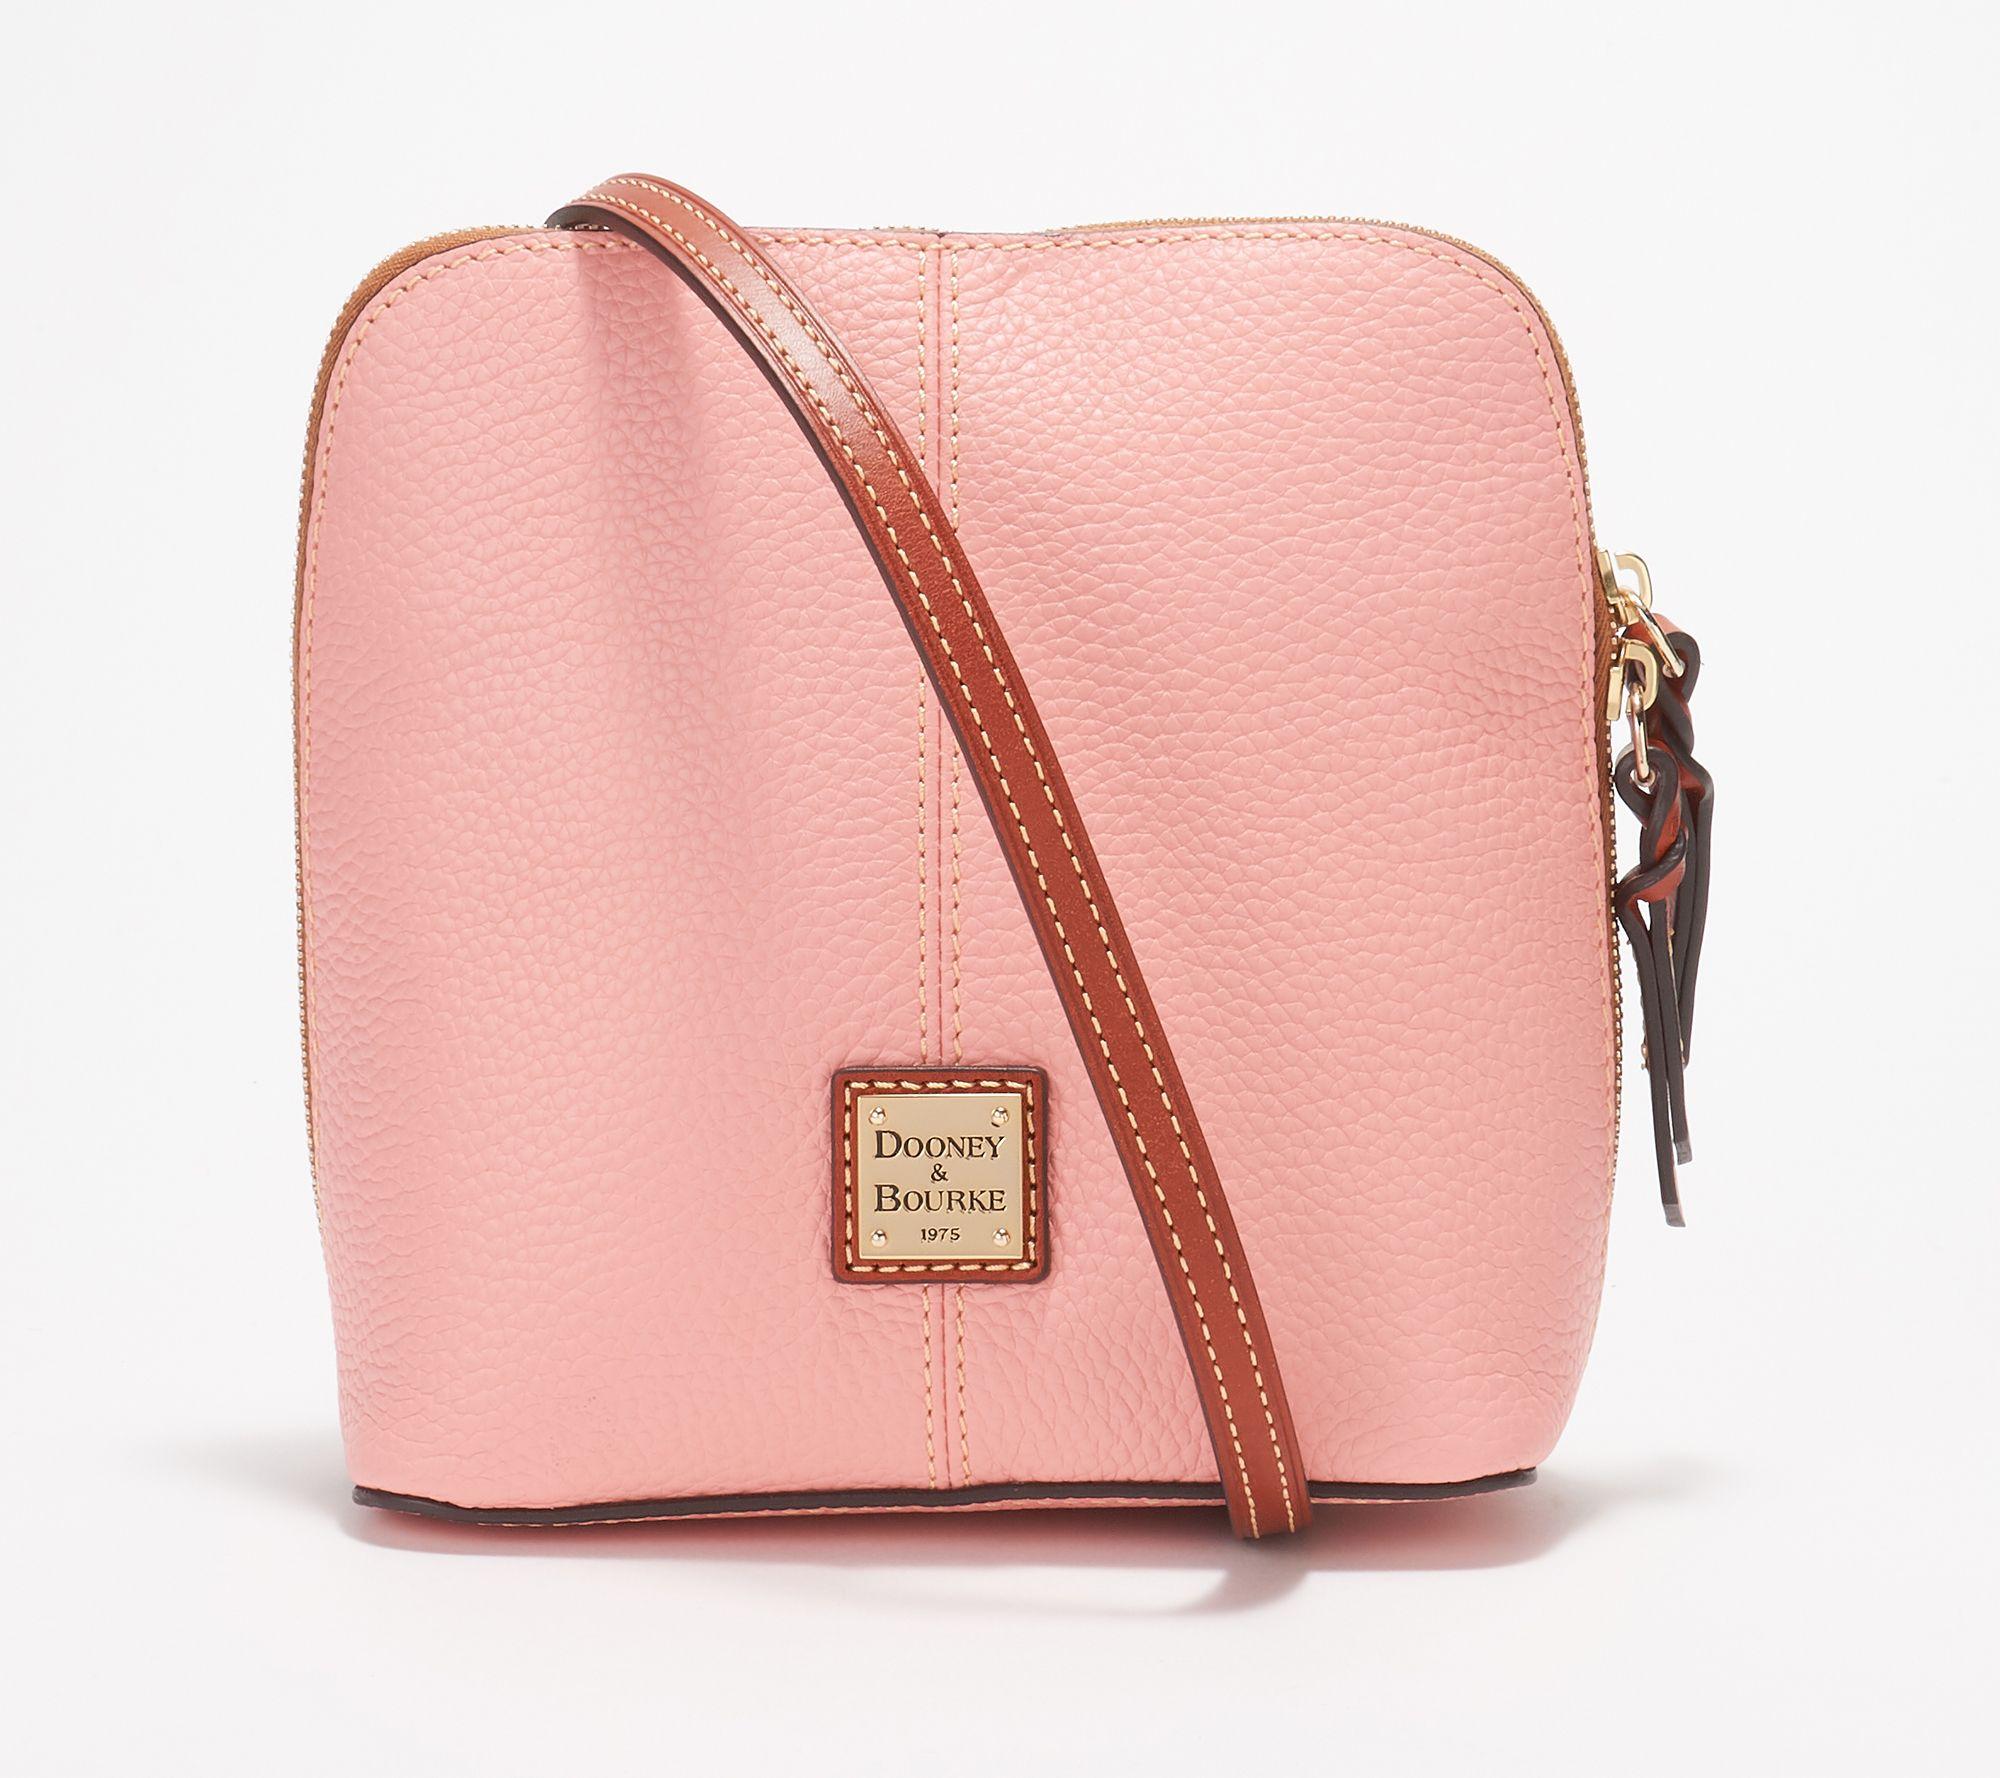 1b48d037040 Dooney   Bourke Pebble Leather Crossbody Handbag -Trixie - Page 1 — QVC.com